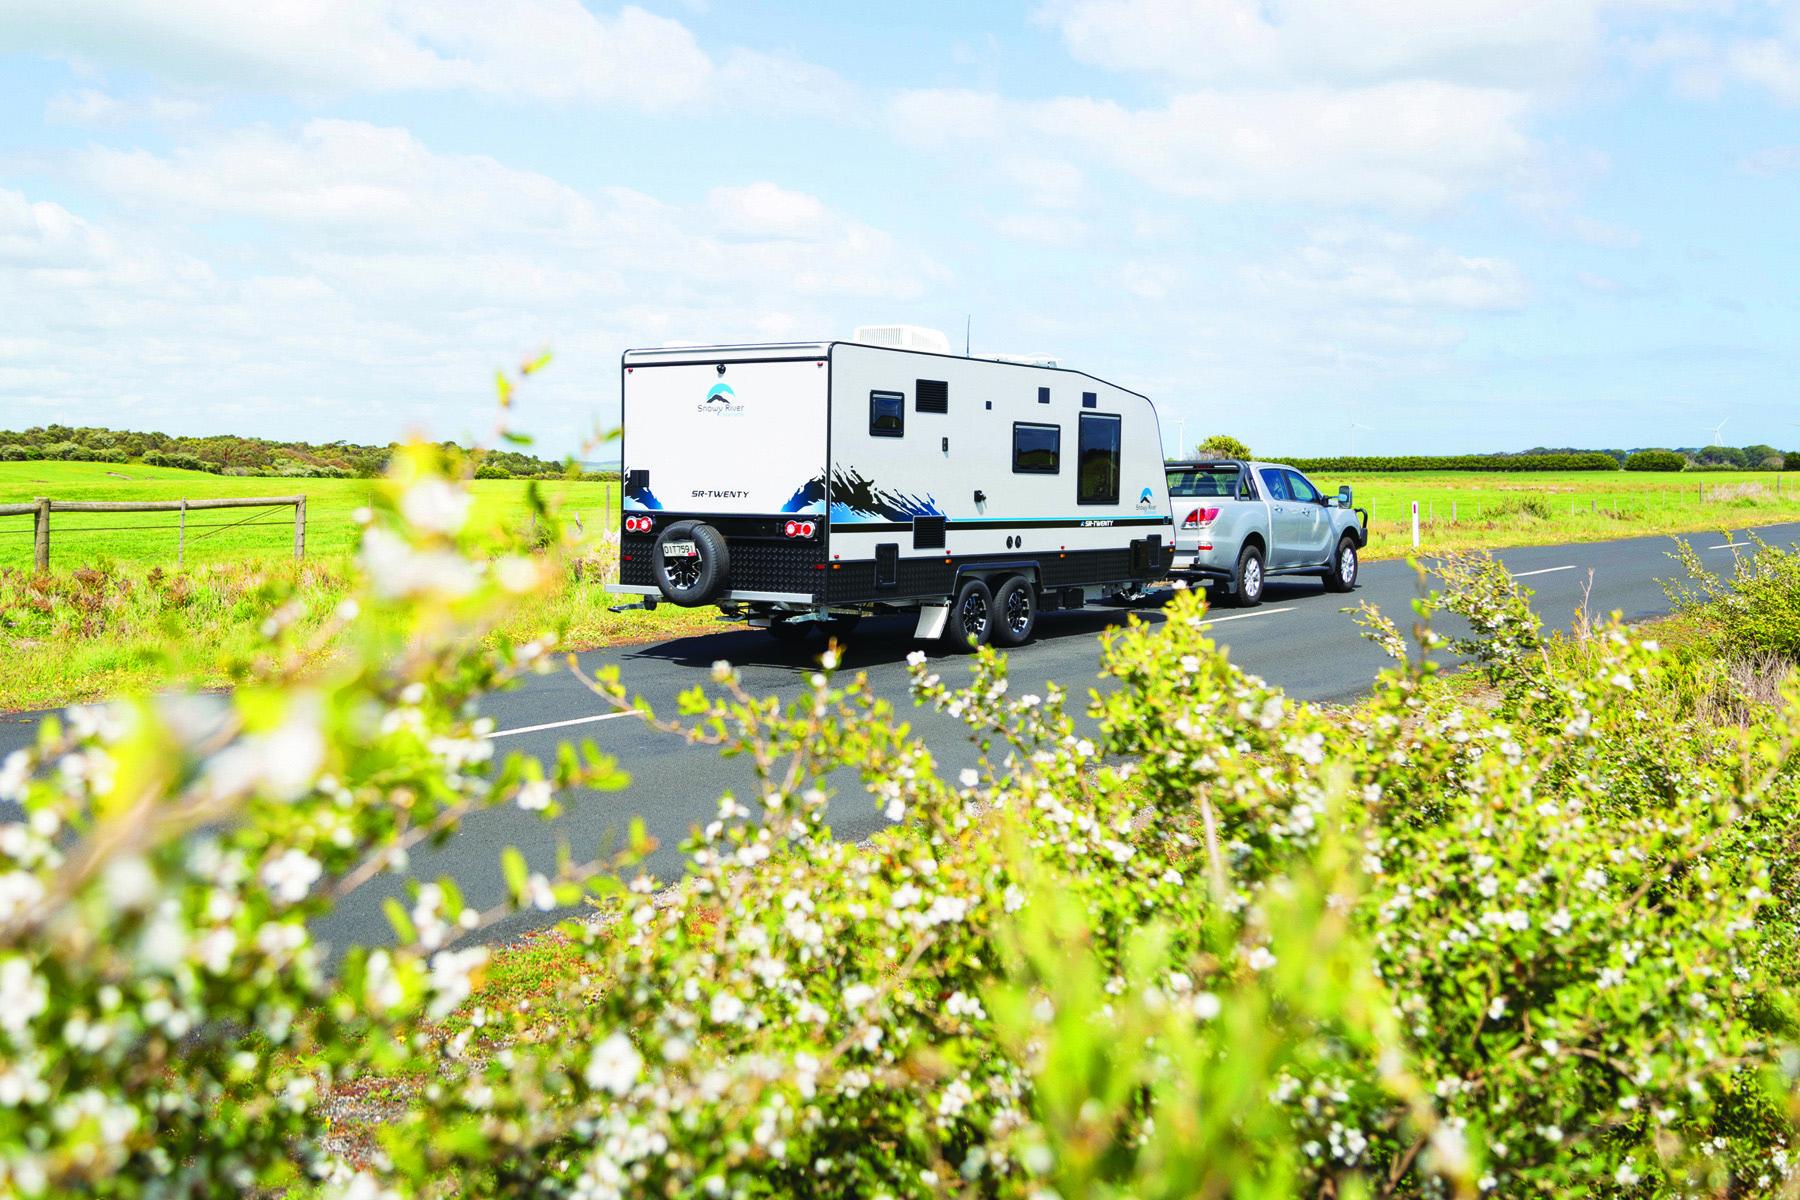 A ute towing a caravan